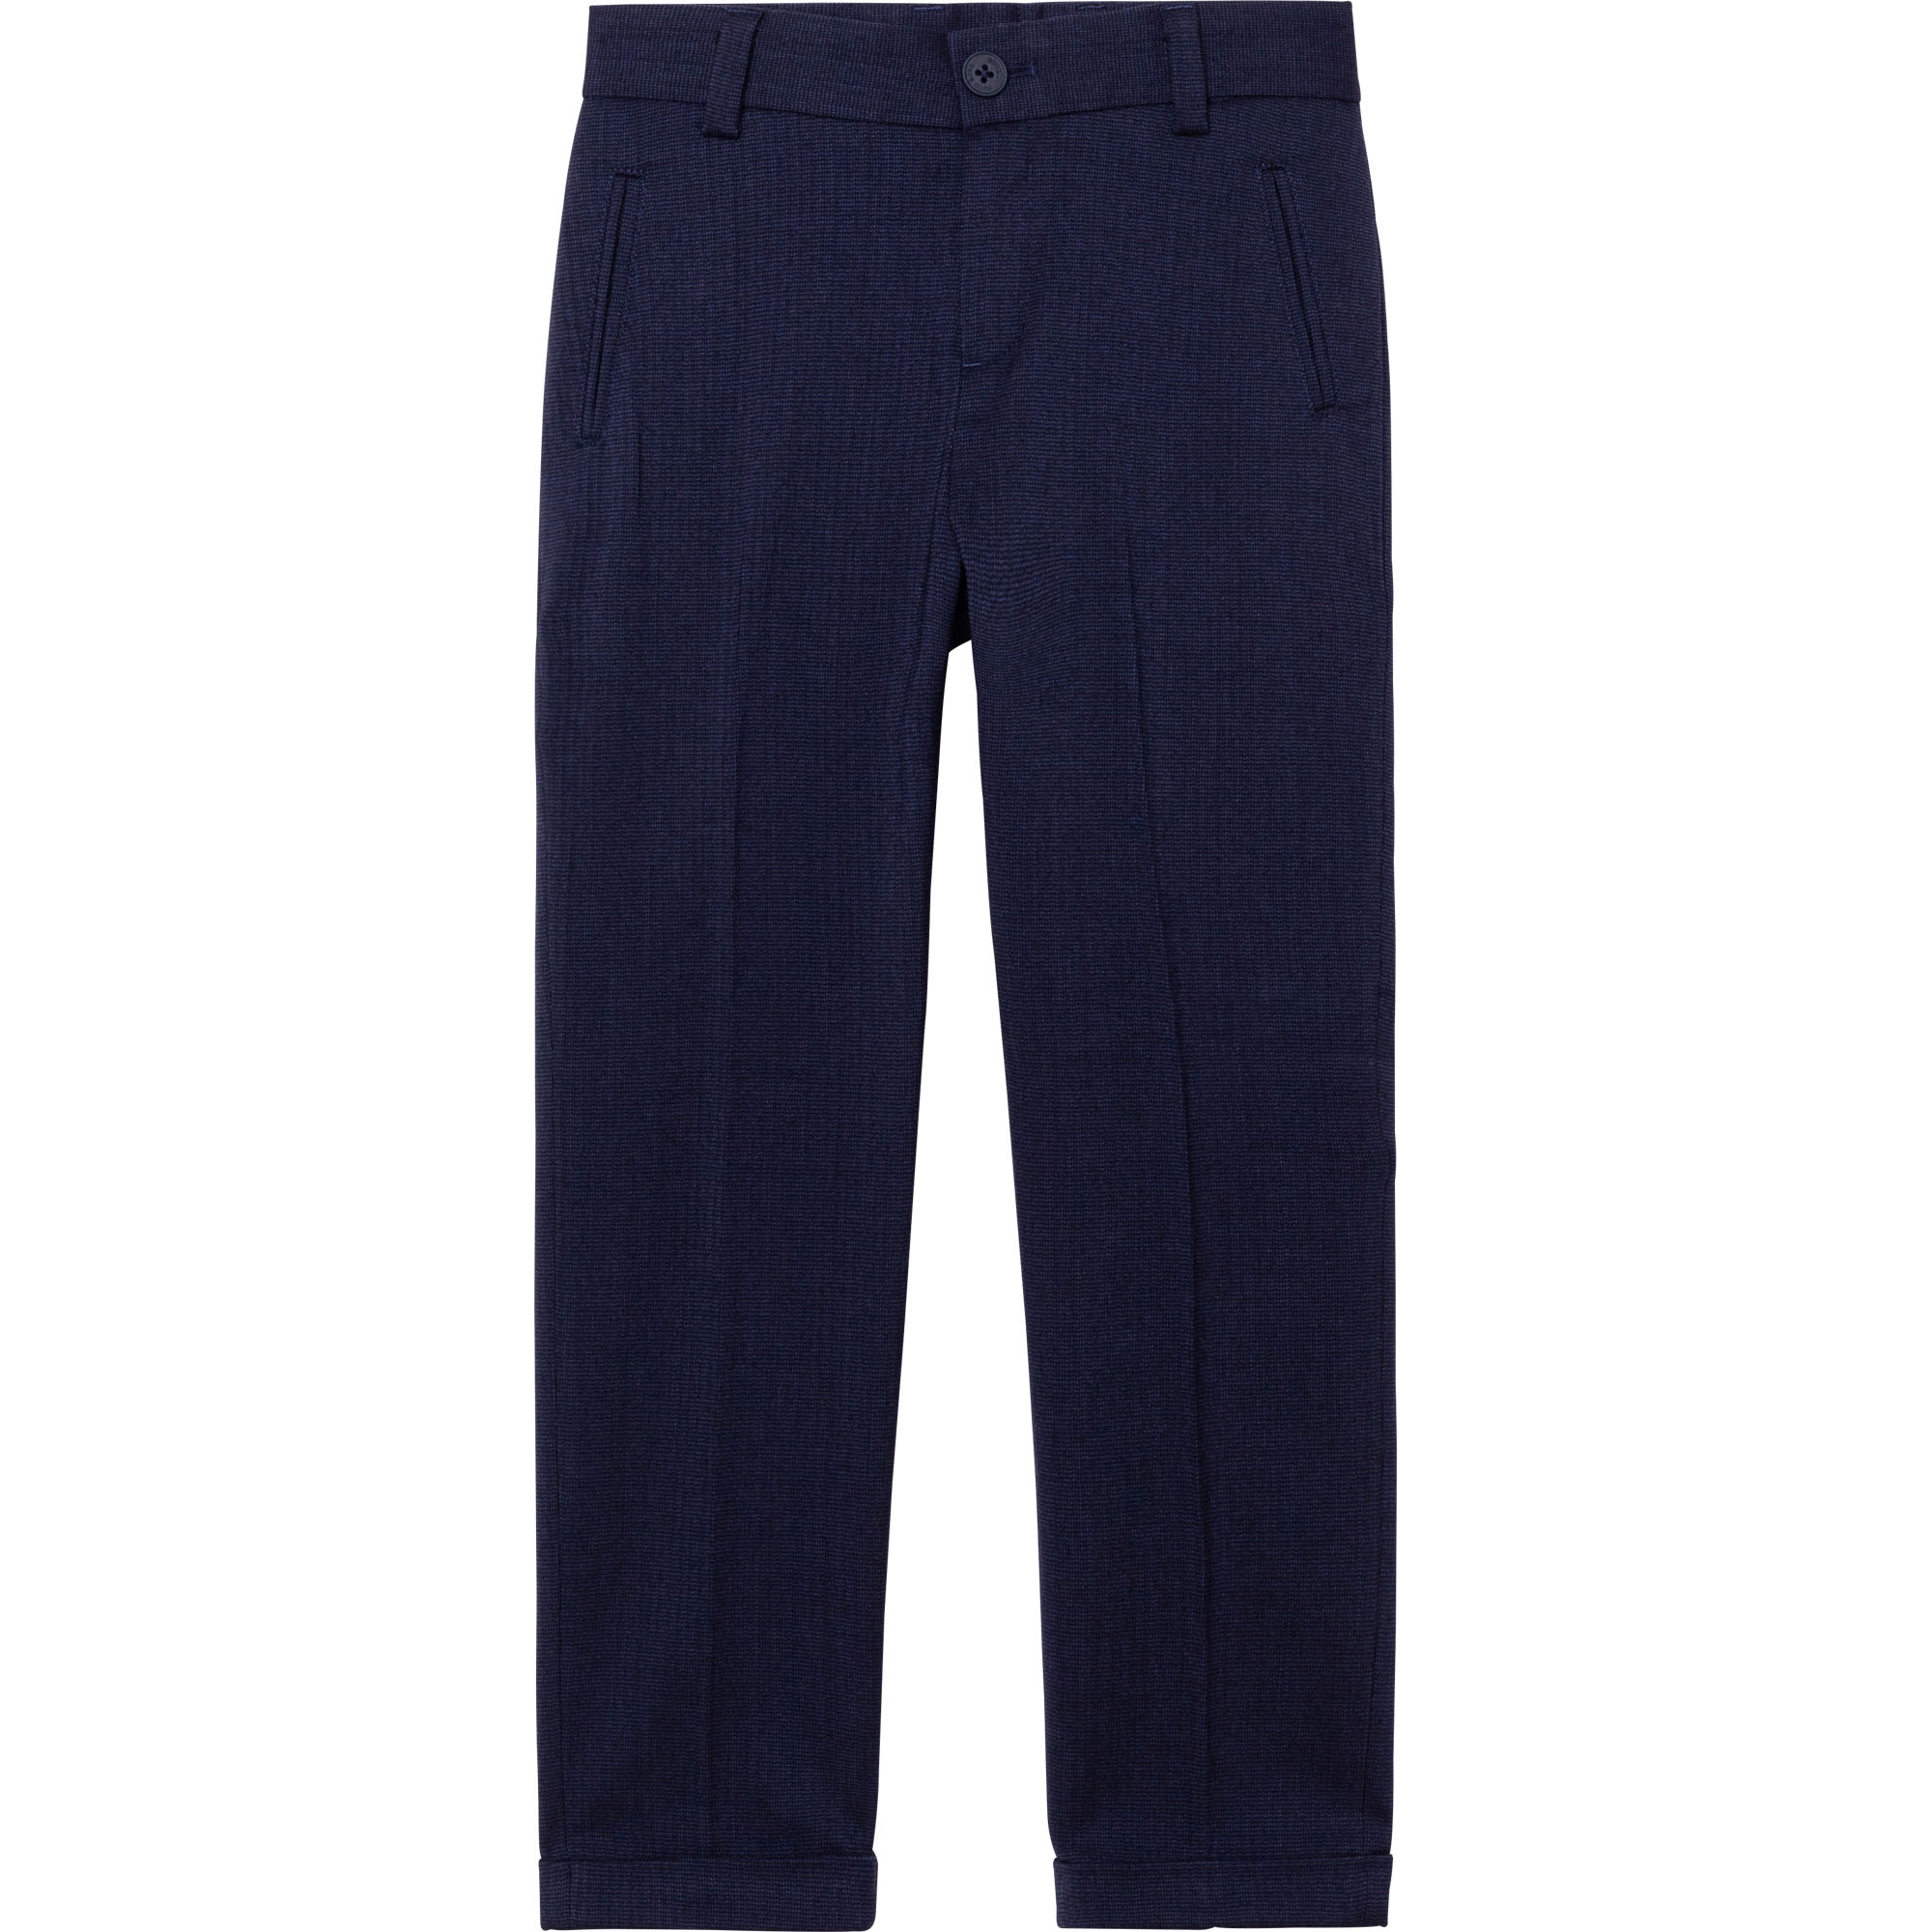 Chevron wool pants BOSS for BOY